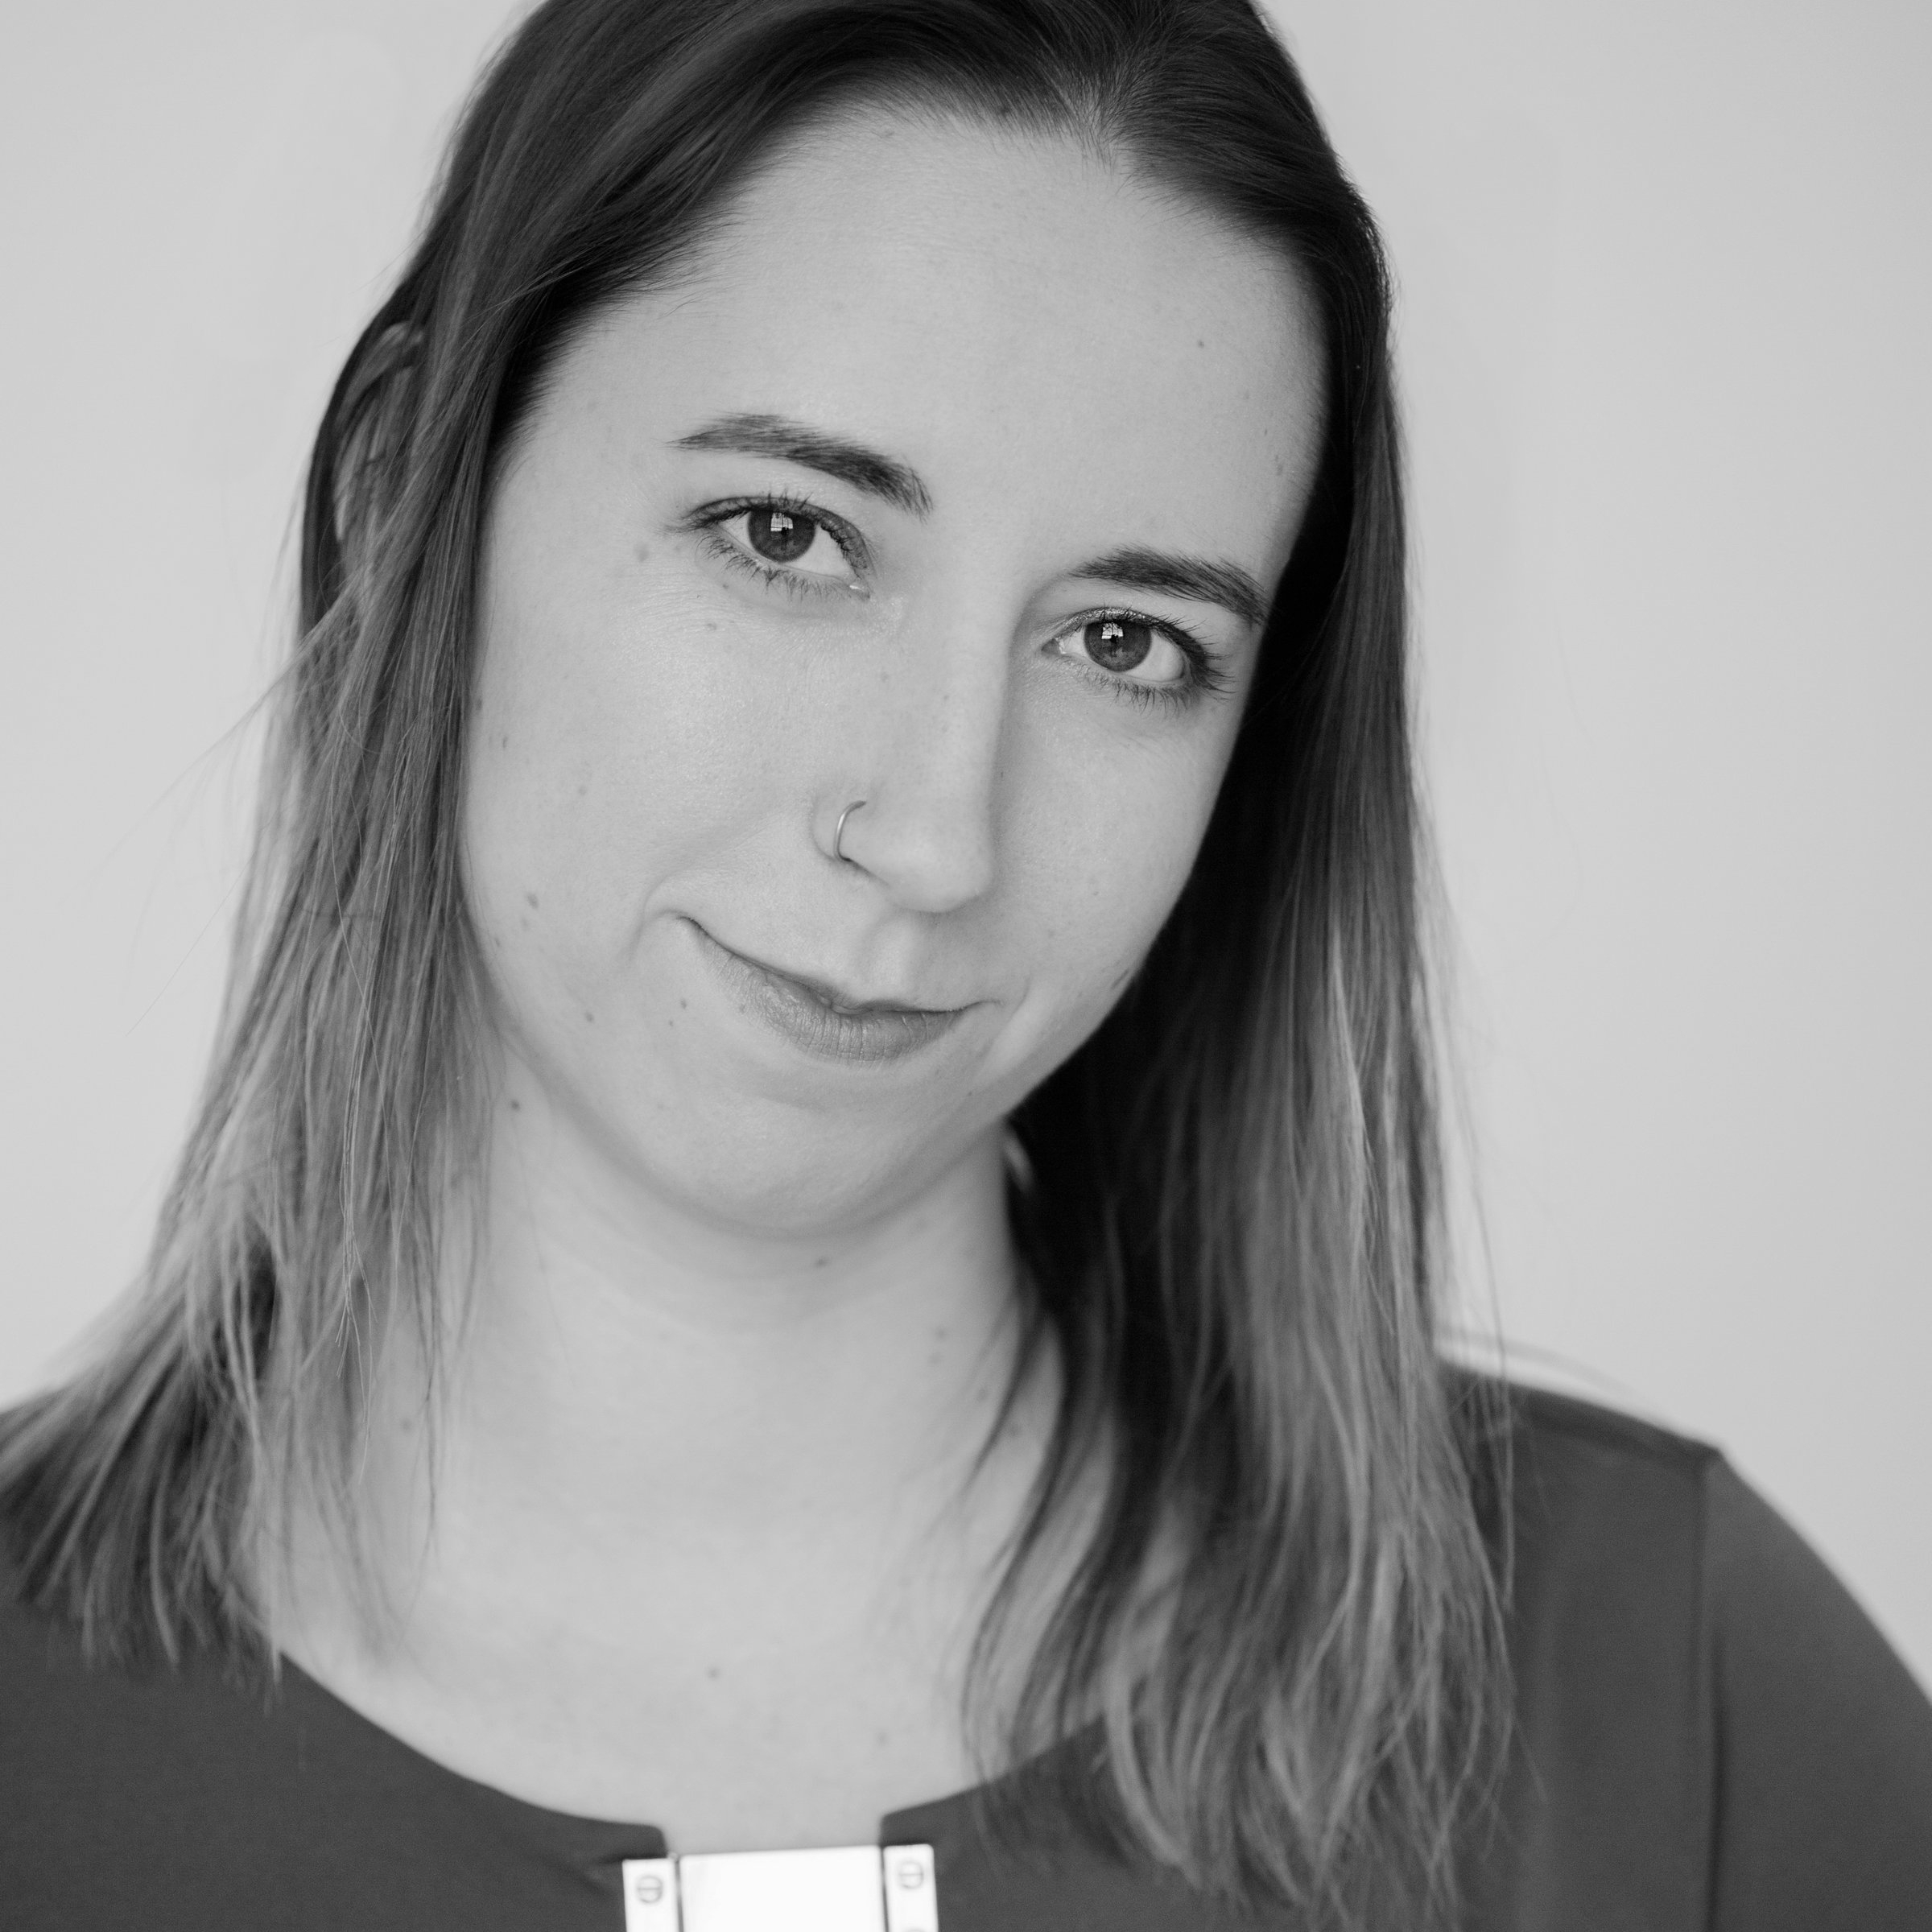 Carly Niehaus